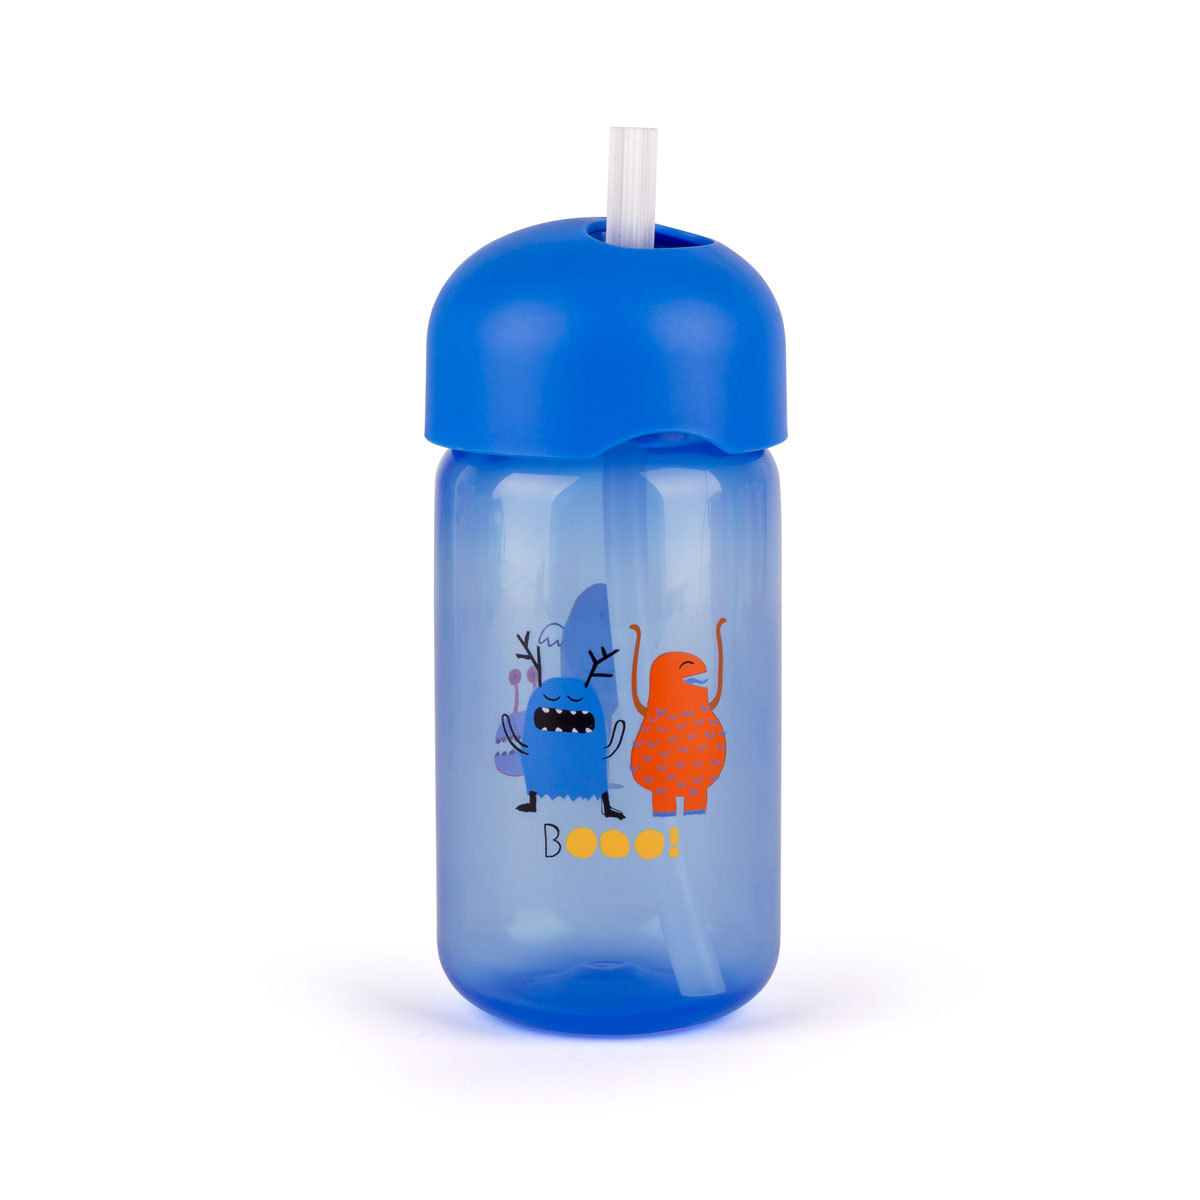 Tasse & Verre Tasse d'apprentissage avec Paille Boo - Bleu Tasse d'apprentissage avec Paille Boo - Bleu